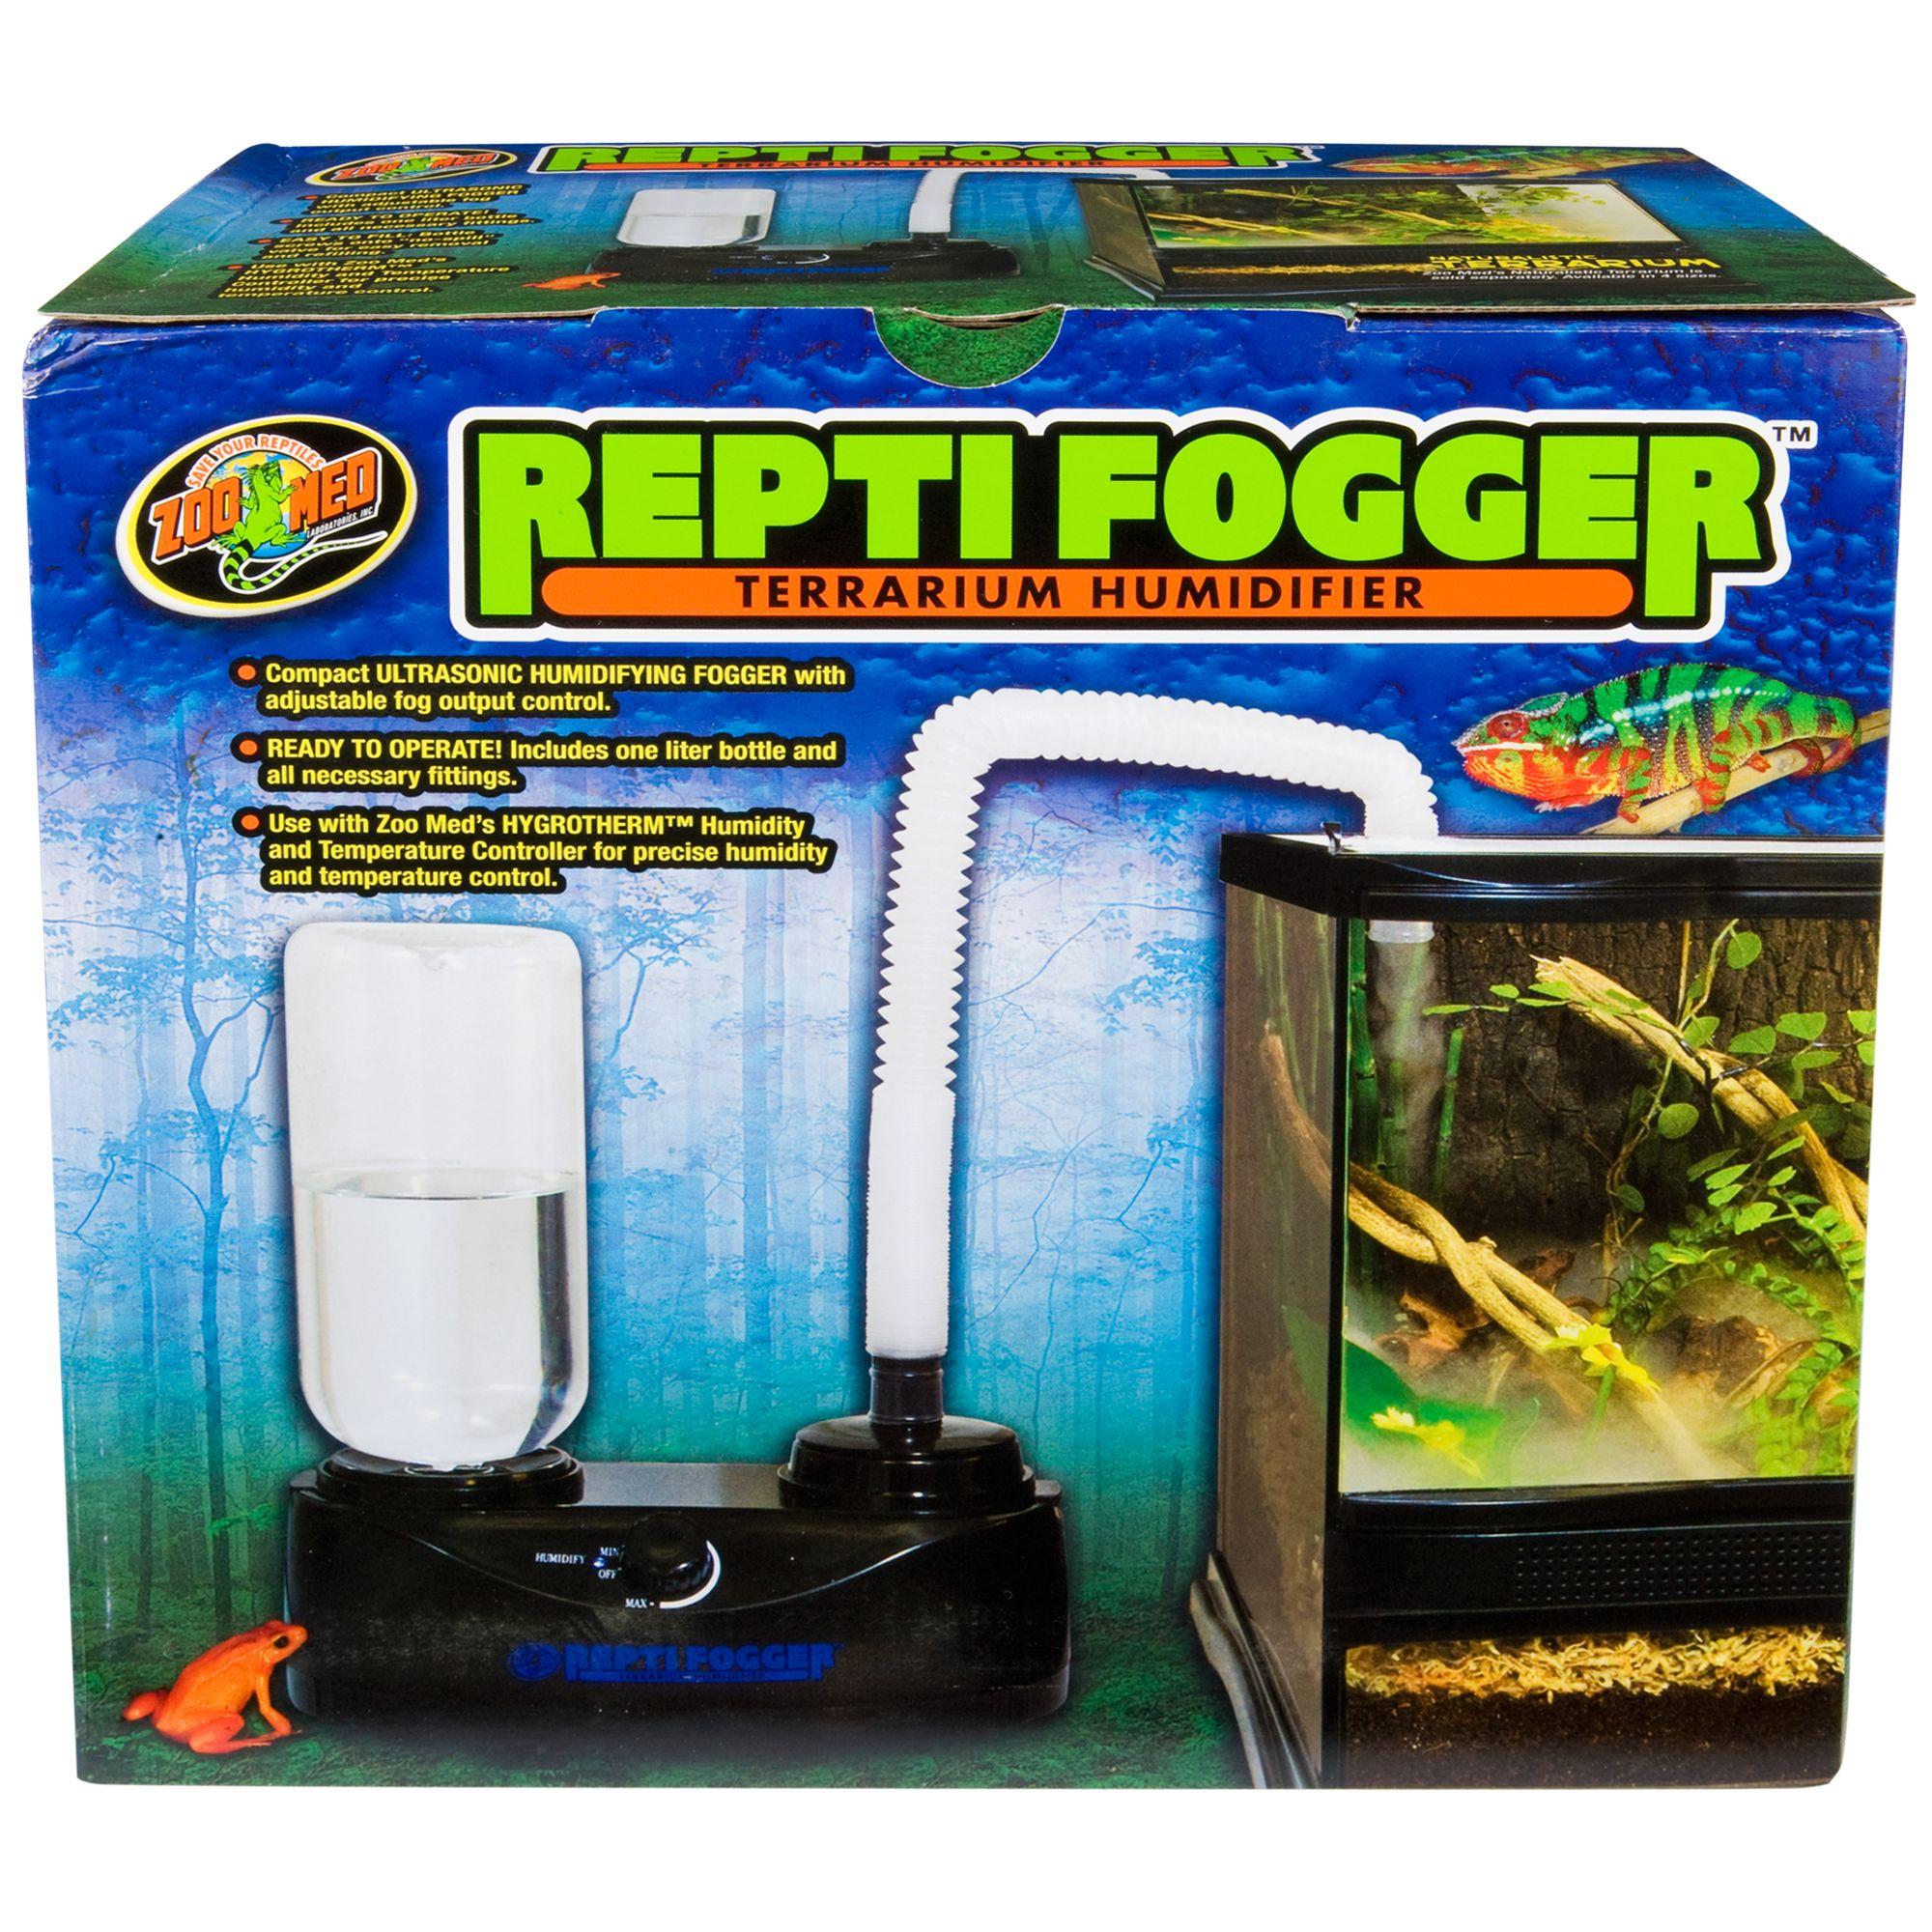 Zoo Med Repti Fogger Reptile Terrarium Humidifier